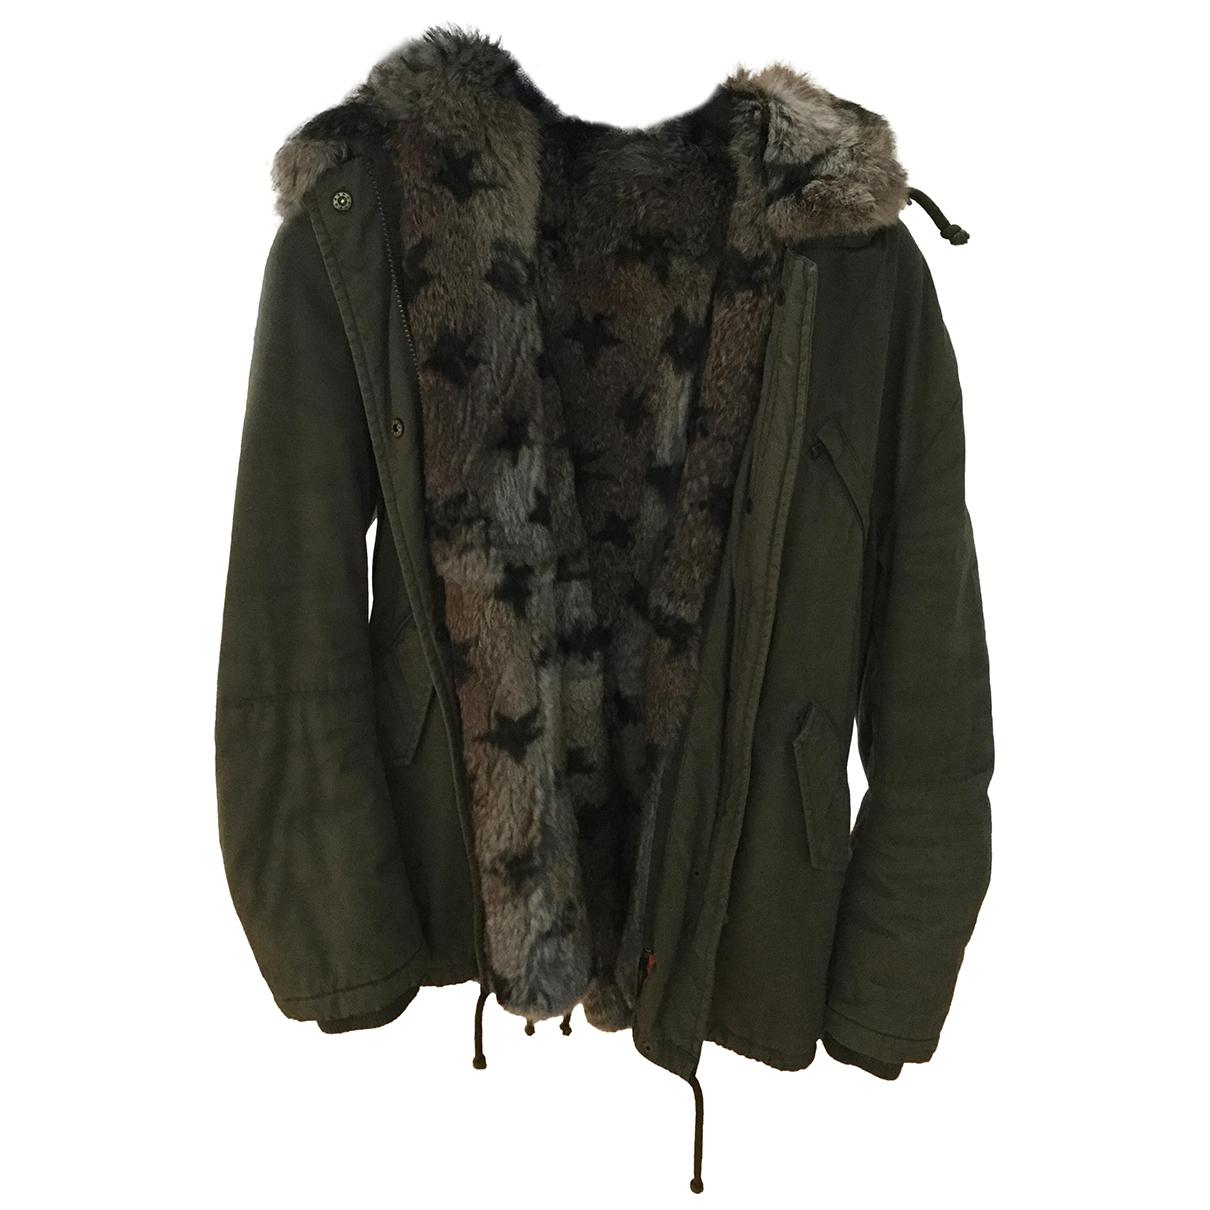 Iq+ Berlin \N Green Cotton jacket for Women XS International